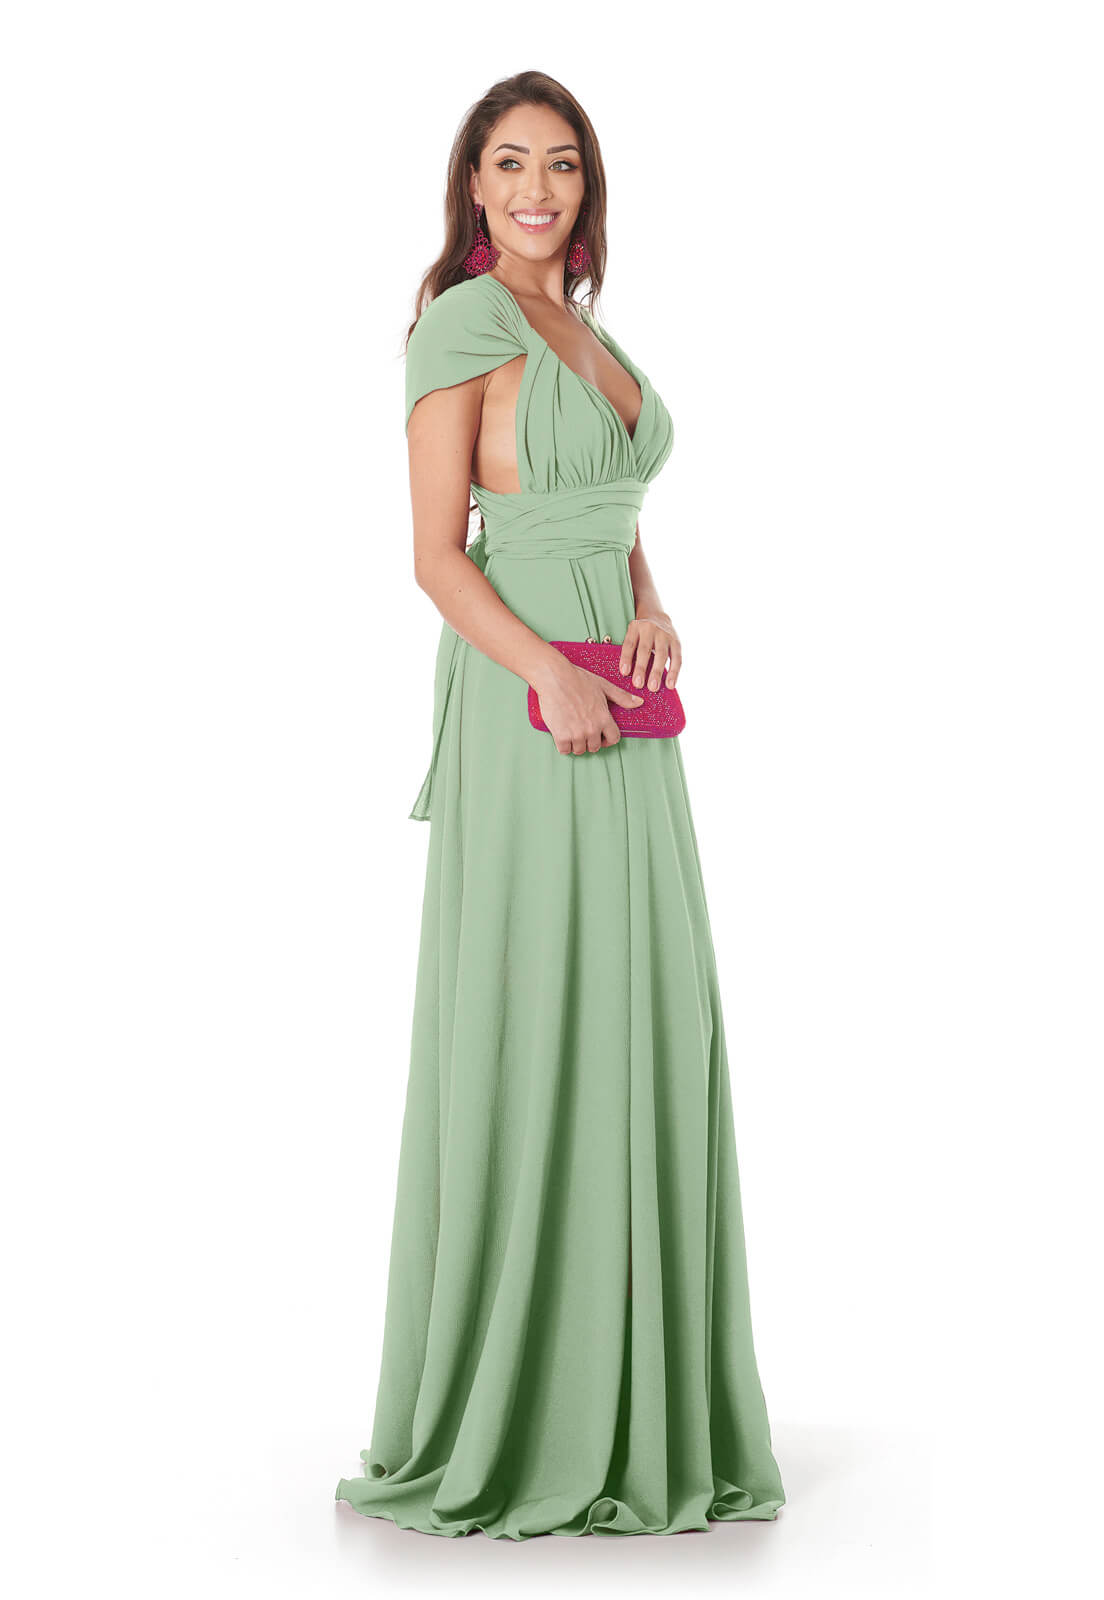 Vestido Longo Mil Formas Verde Claro Lala Dubi